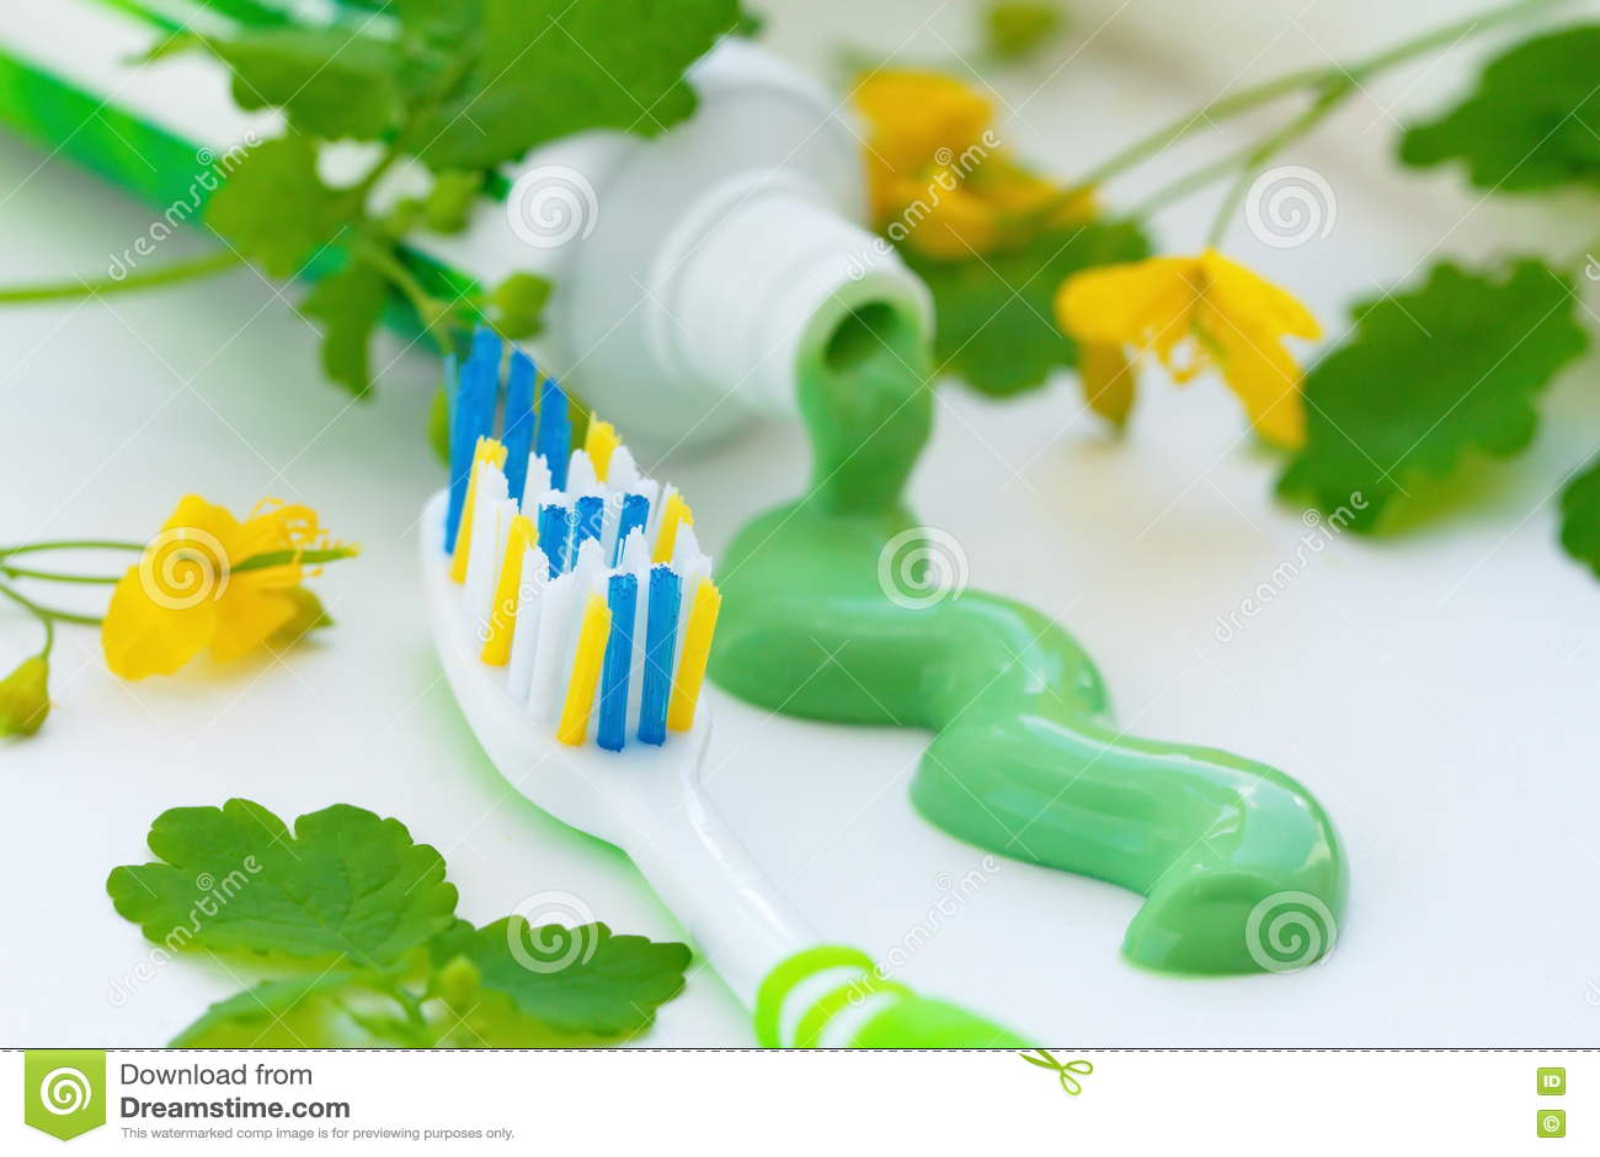 Травяная зубная паста и зубная щетка